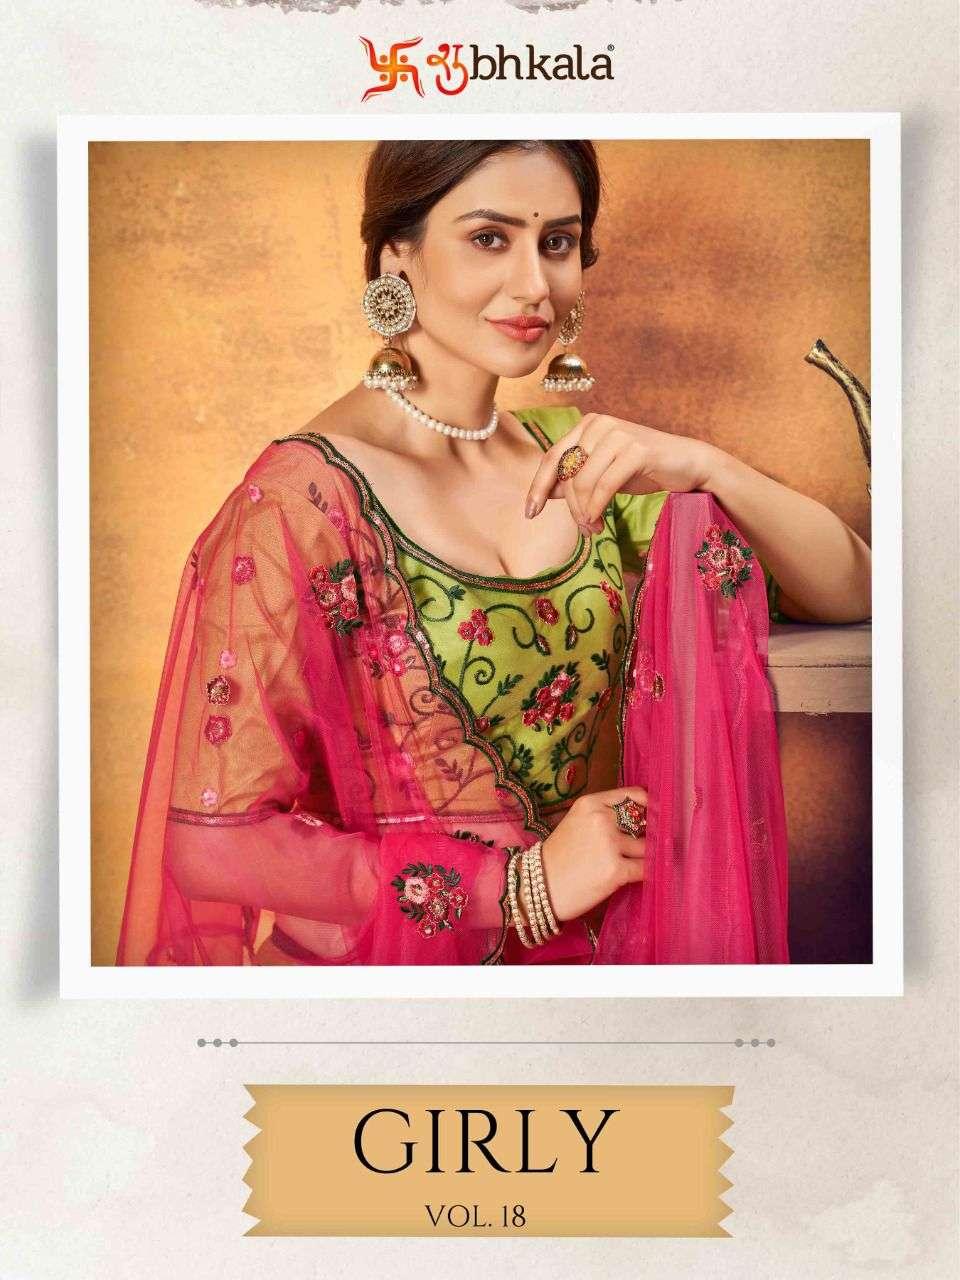 Shubhkala Girly Vol 18 By Khushboo Stylish Lehenga Choli New Catalog Supplier